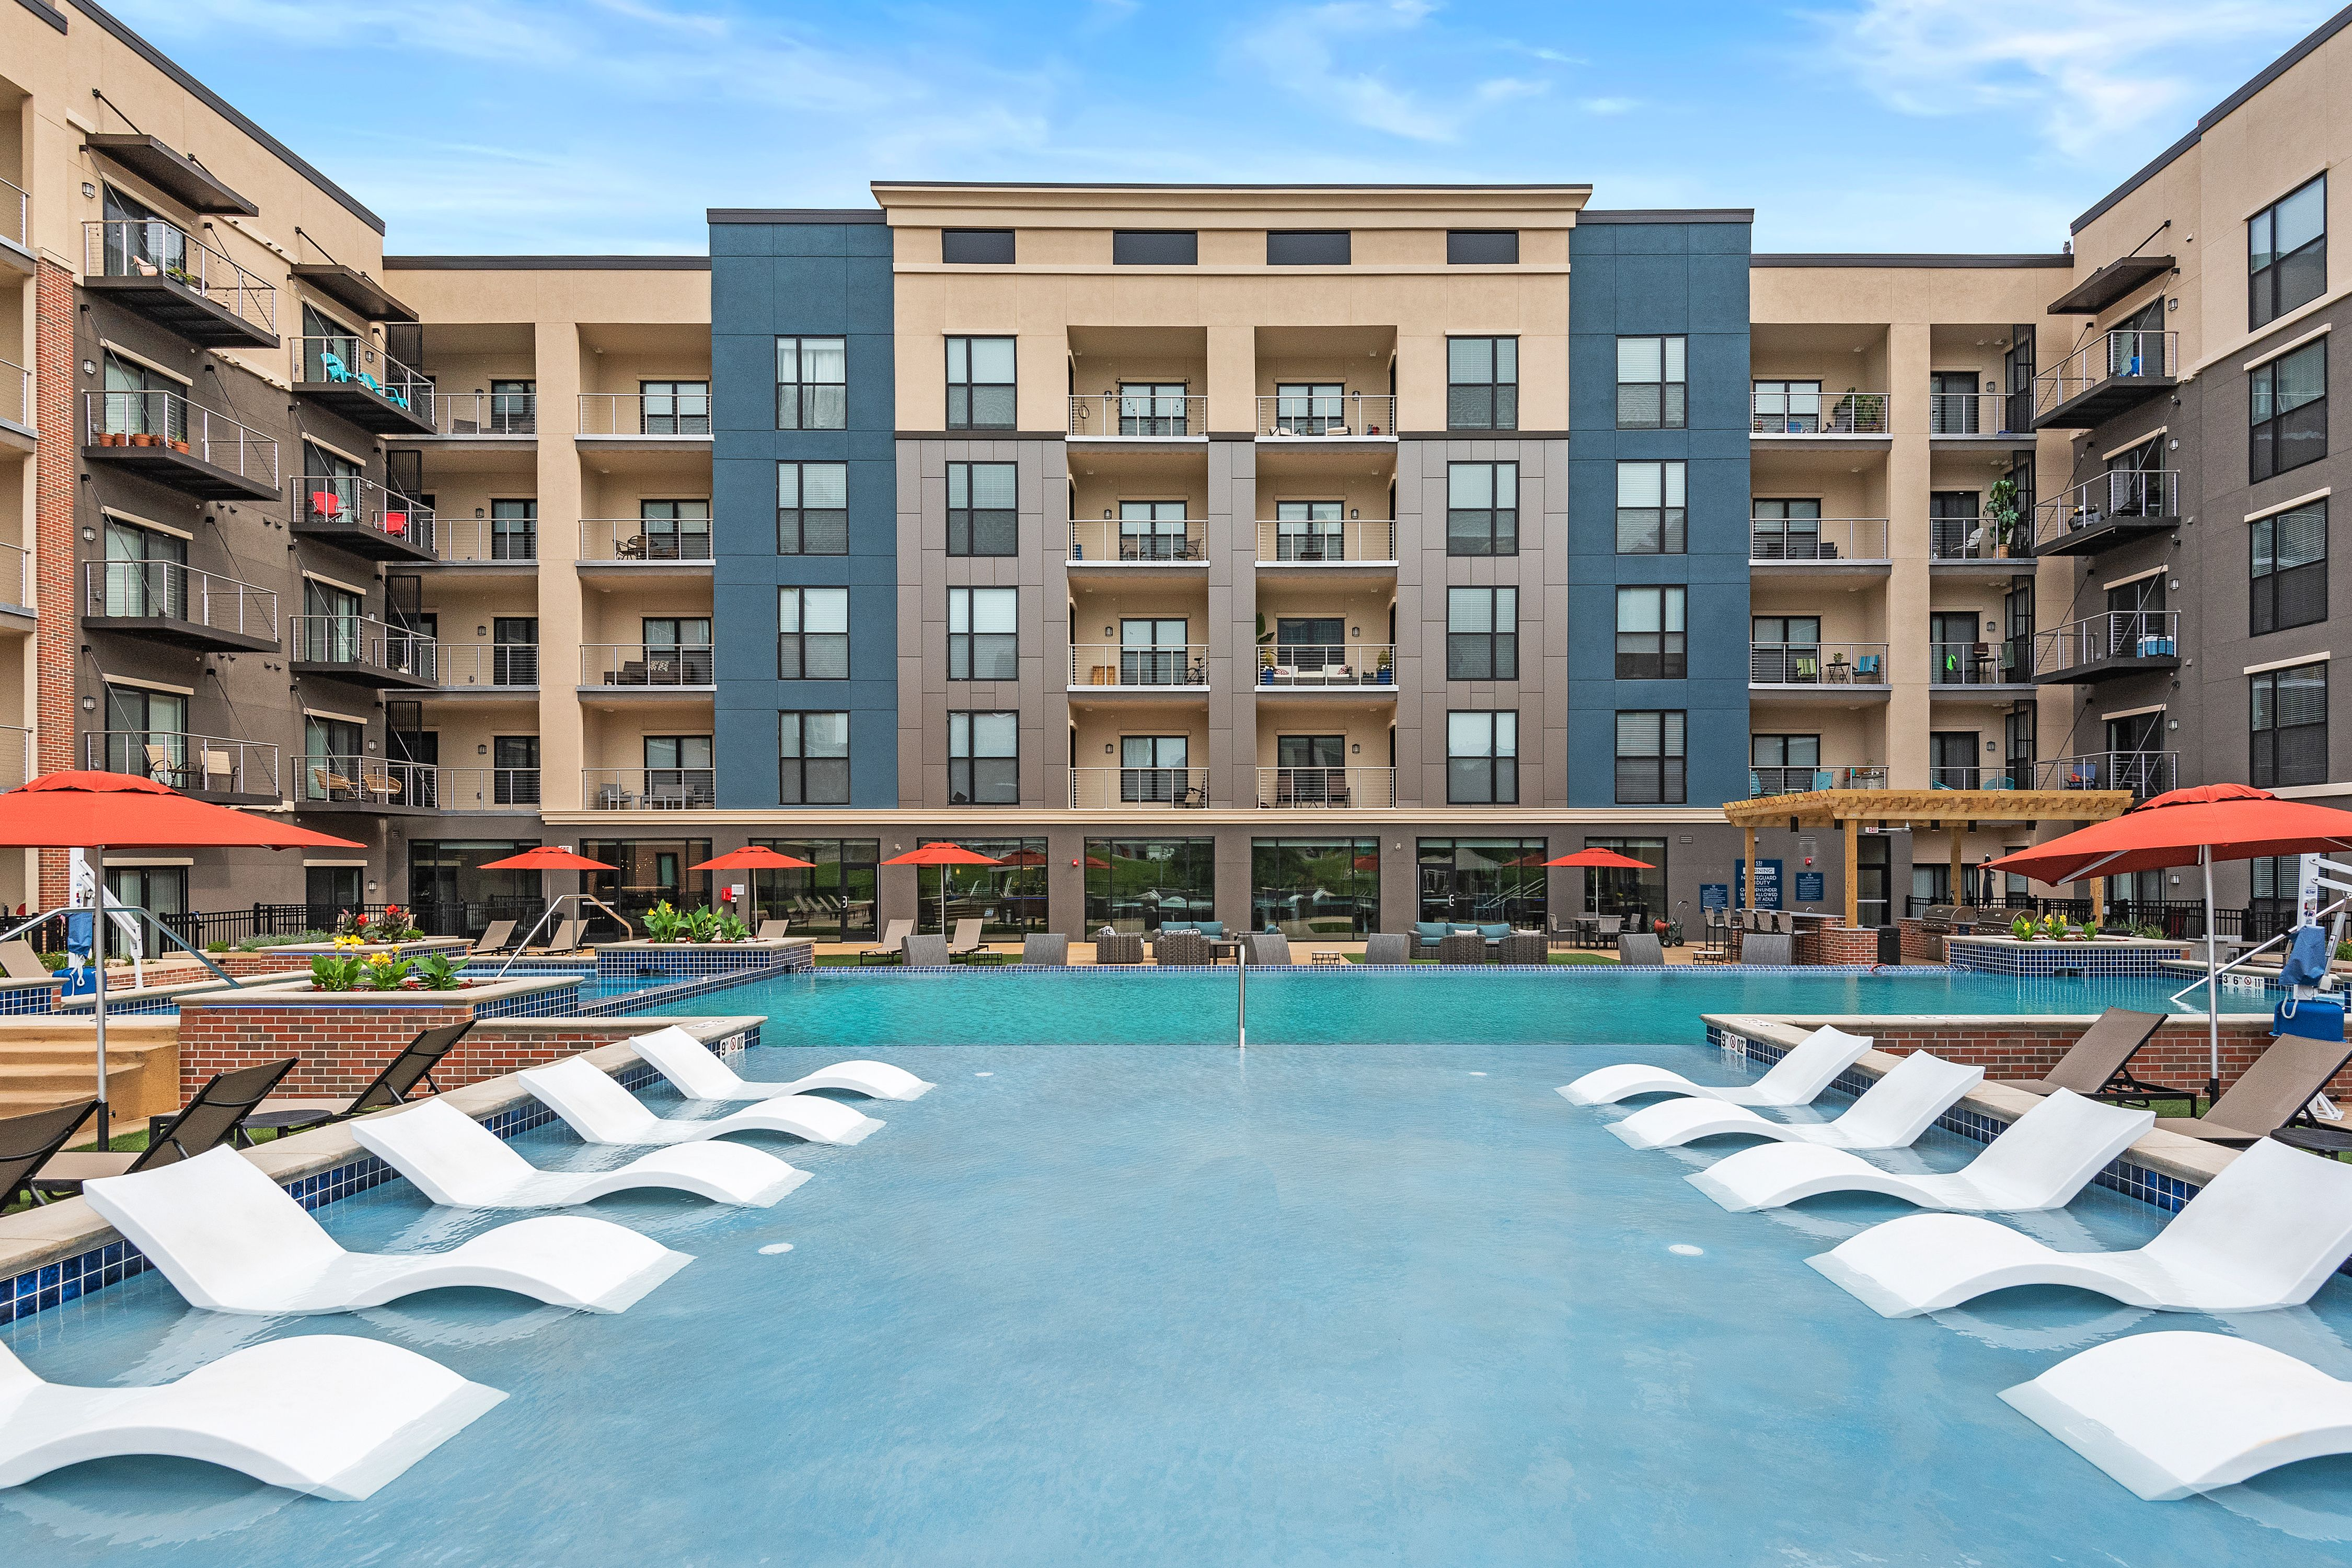 531 Grand Amenities Nspjarchitects Kansascity Kcmo Multifamily Luxuryapartments Apartments Pool Pooldeck Downtown Dow Architect Kansas City Pool Deck